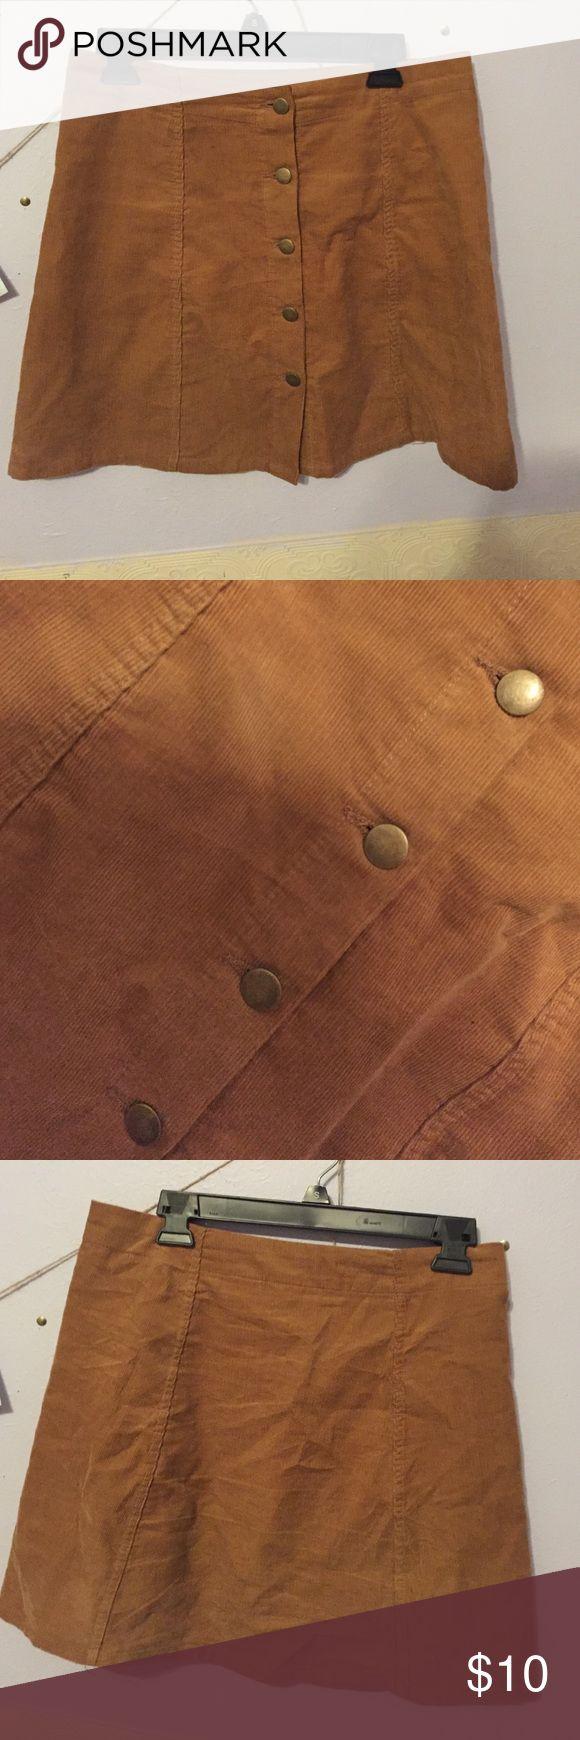 Mustard corduroy button down skirt Size M worn twice button mustard yellow skirt Target Skirts Mini